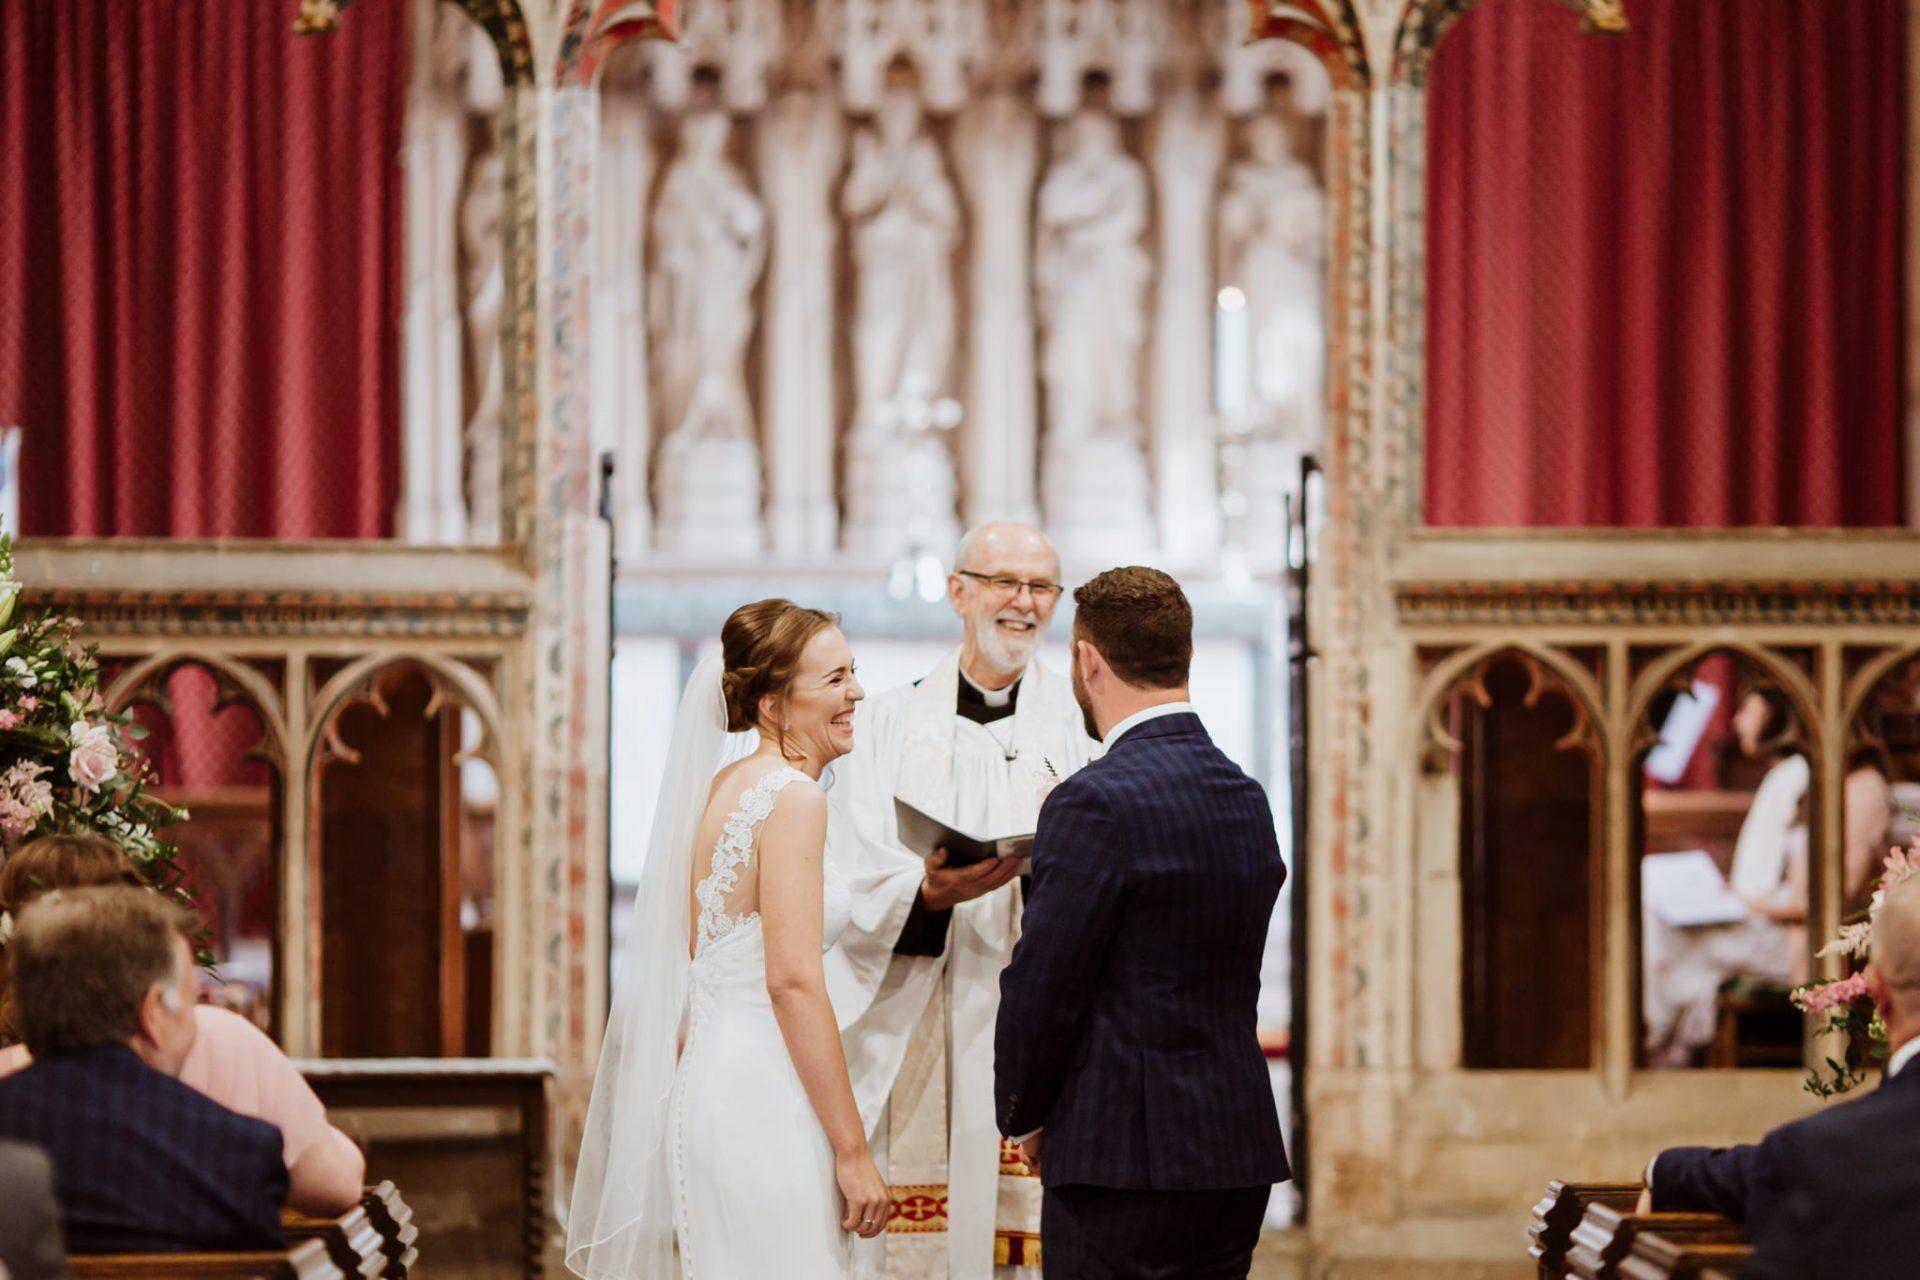 bride and groom wedding ceremony st mary's church berkeley